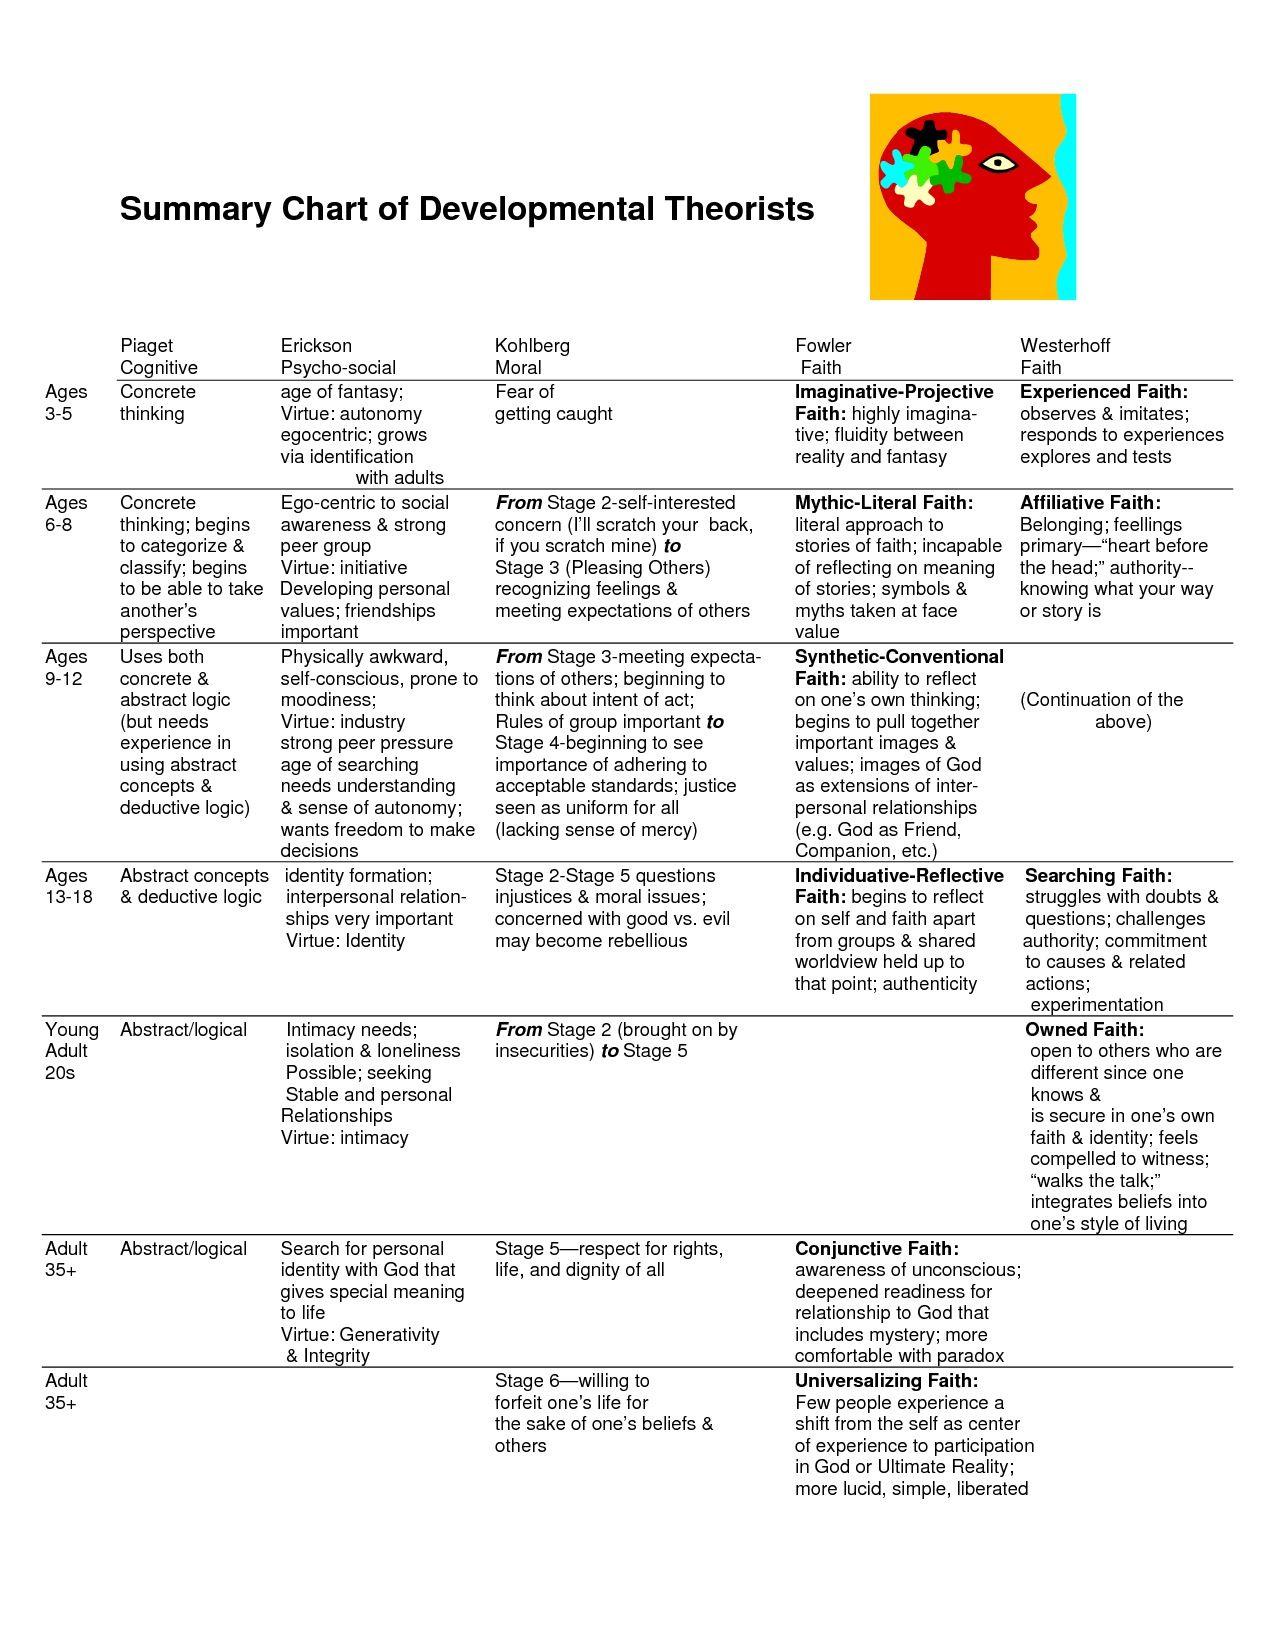 Bandura Social Learning Theory Diagram Trs Plug Wiring Chart Of Developmental Theories  Psychology Pinte